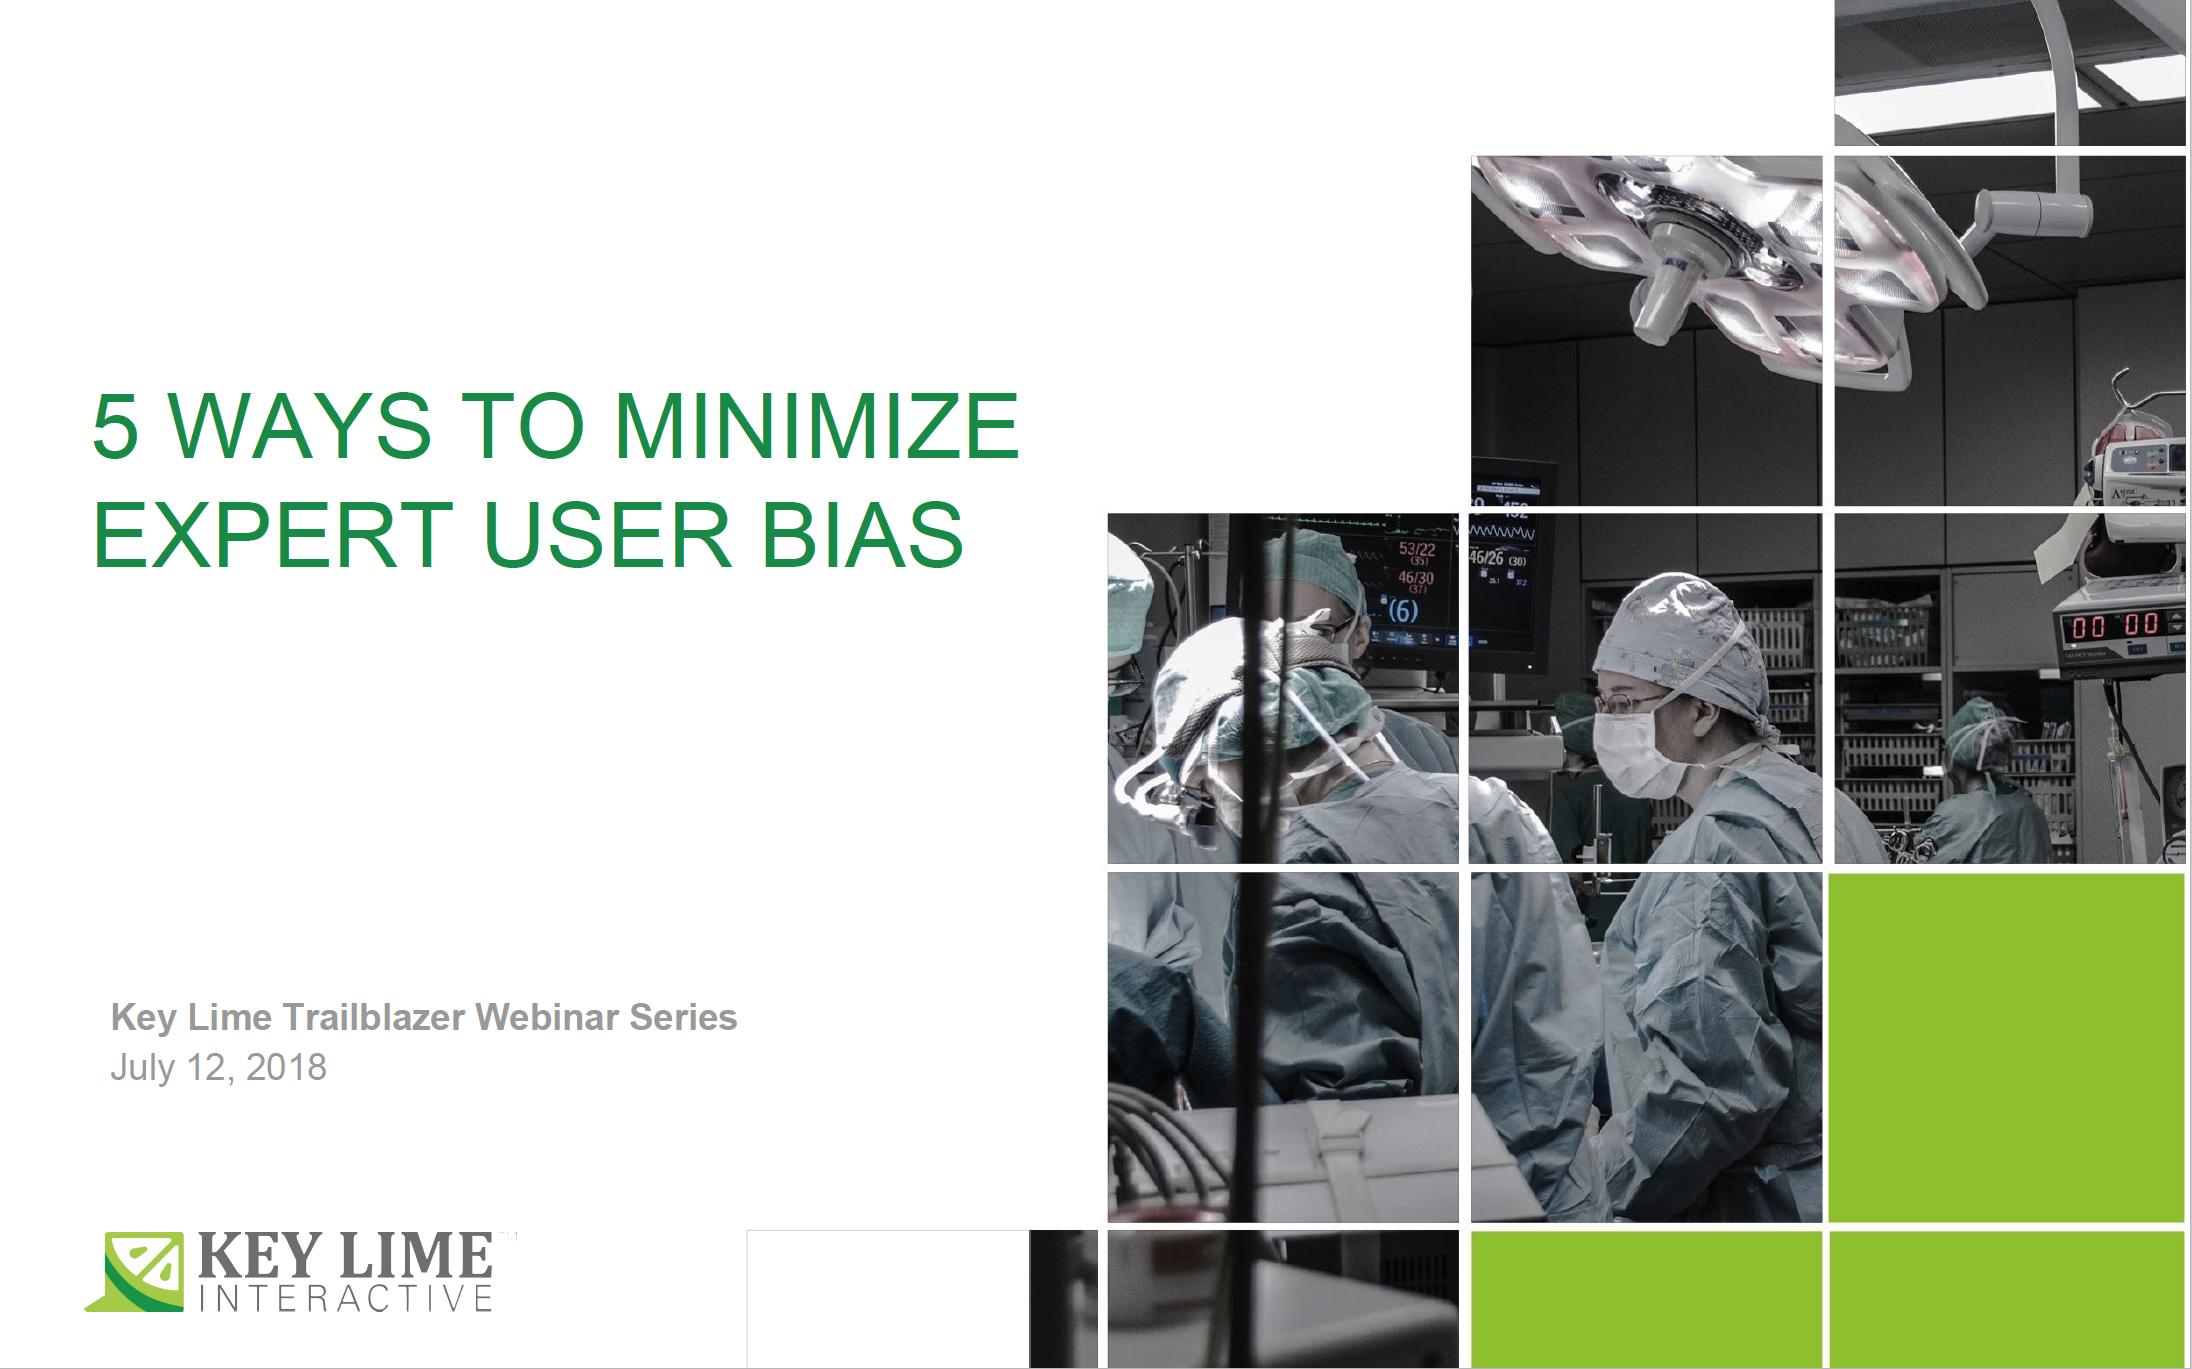 5-ways-to-minimize-expert-user-bias-article-blog-webinar